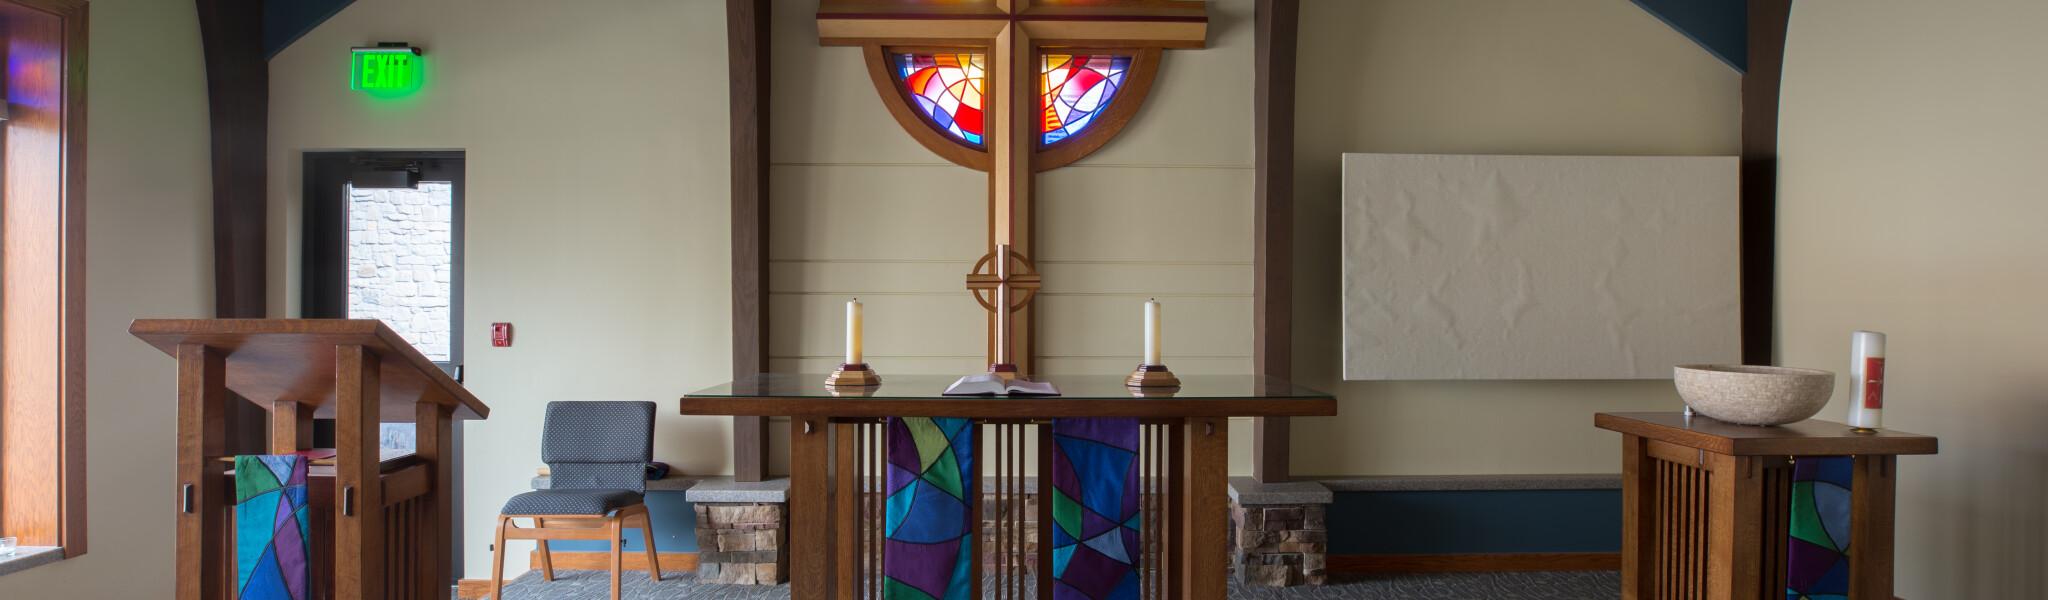 Prayer | Cornerstone Lutheran Church | Cornerstone Lutheran Church